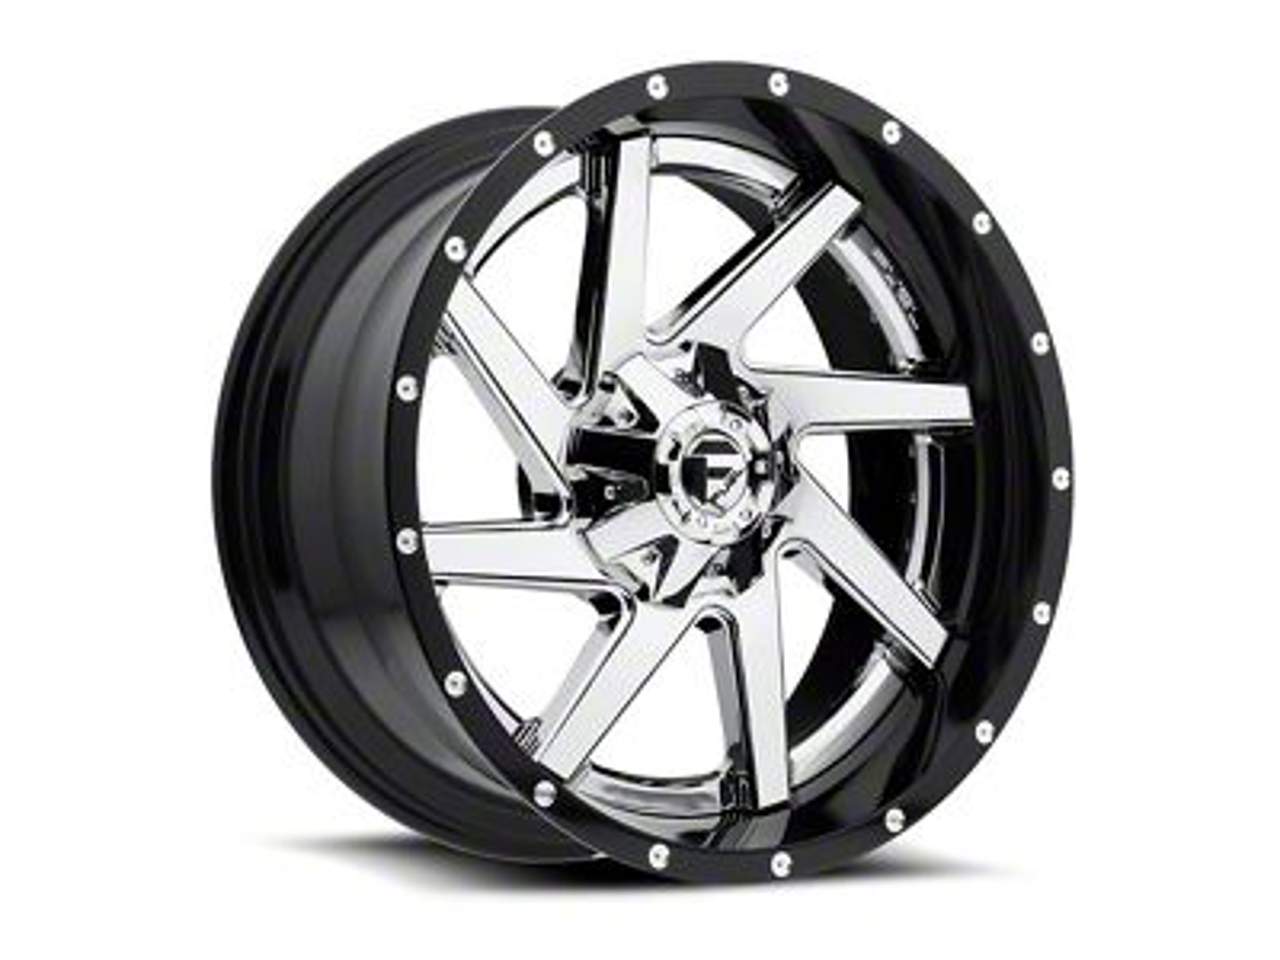 Fuel Wheels Renegade Chrome 6-Lug Wheel - 20x14 (07-18 Sierra 1500)